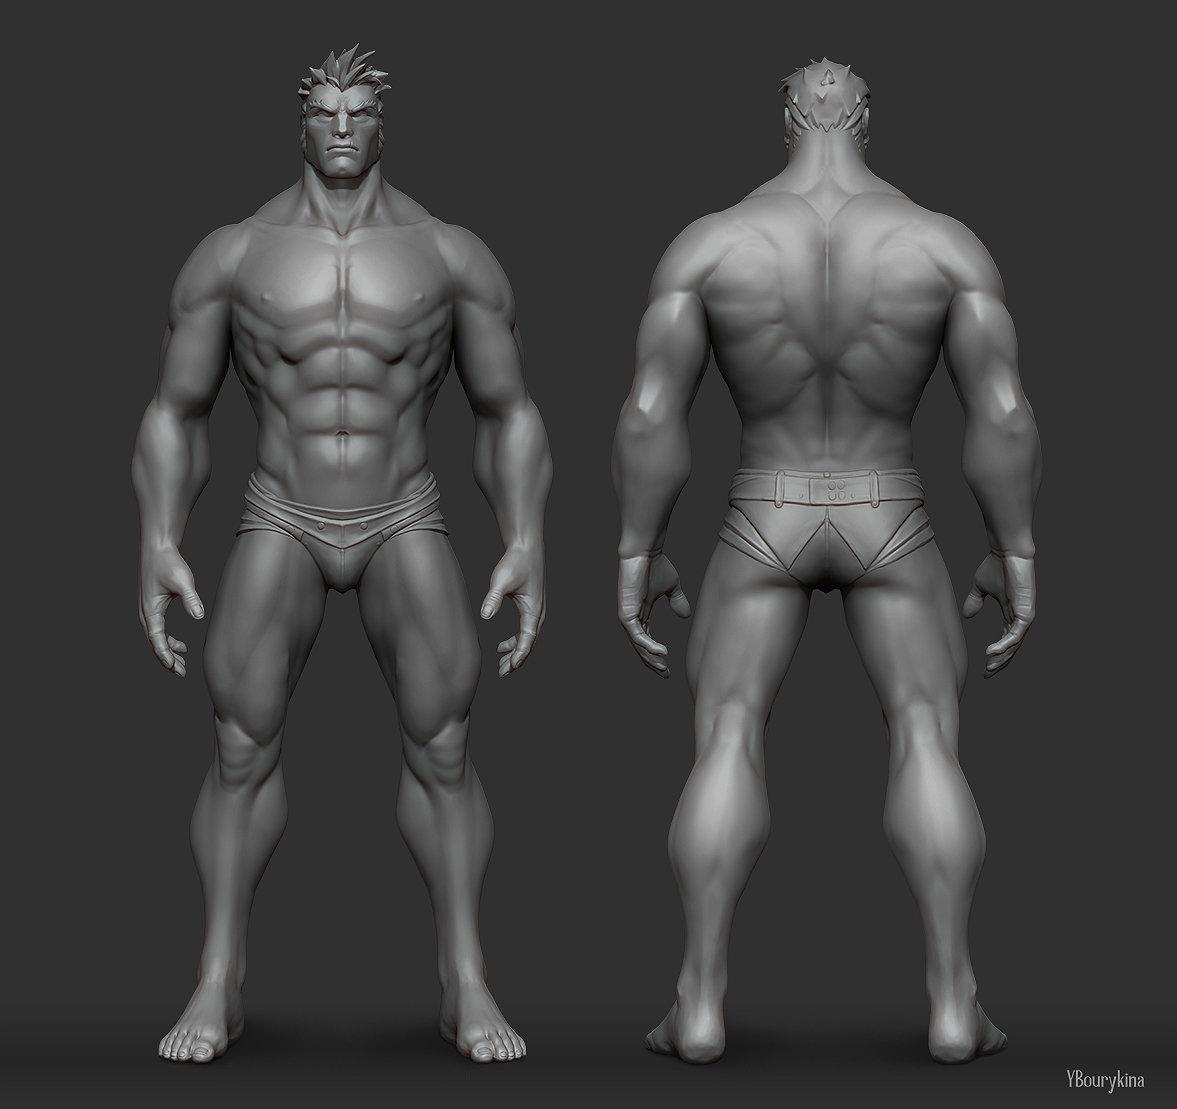 ArtStation - Male Anatomy Study, Yekaterina Bourykina